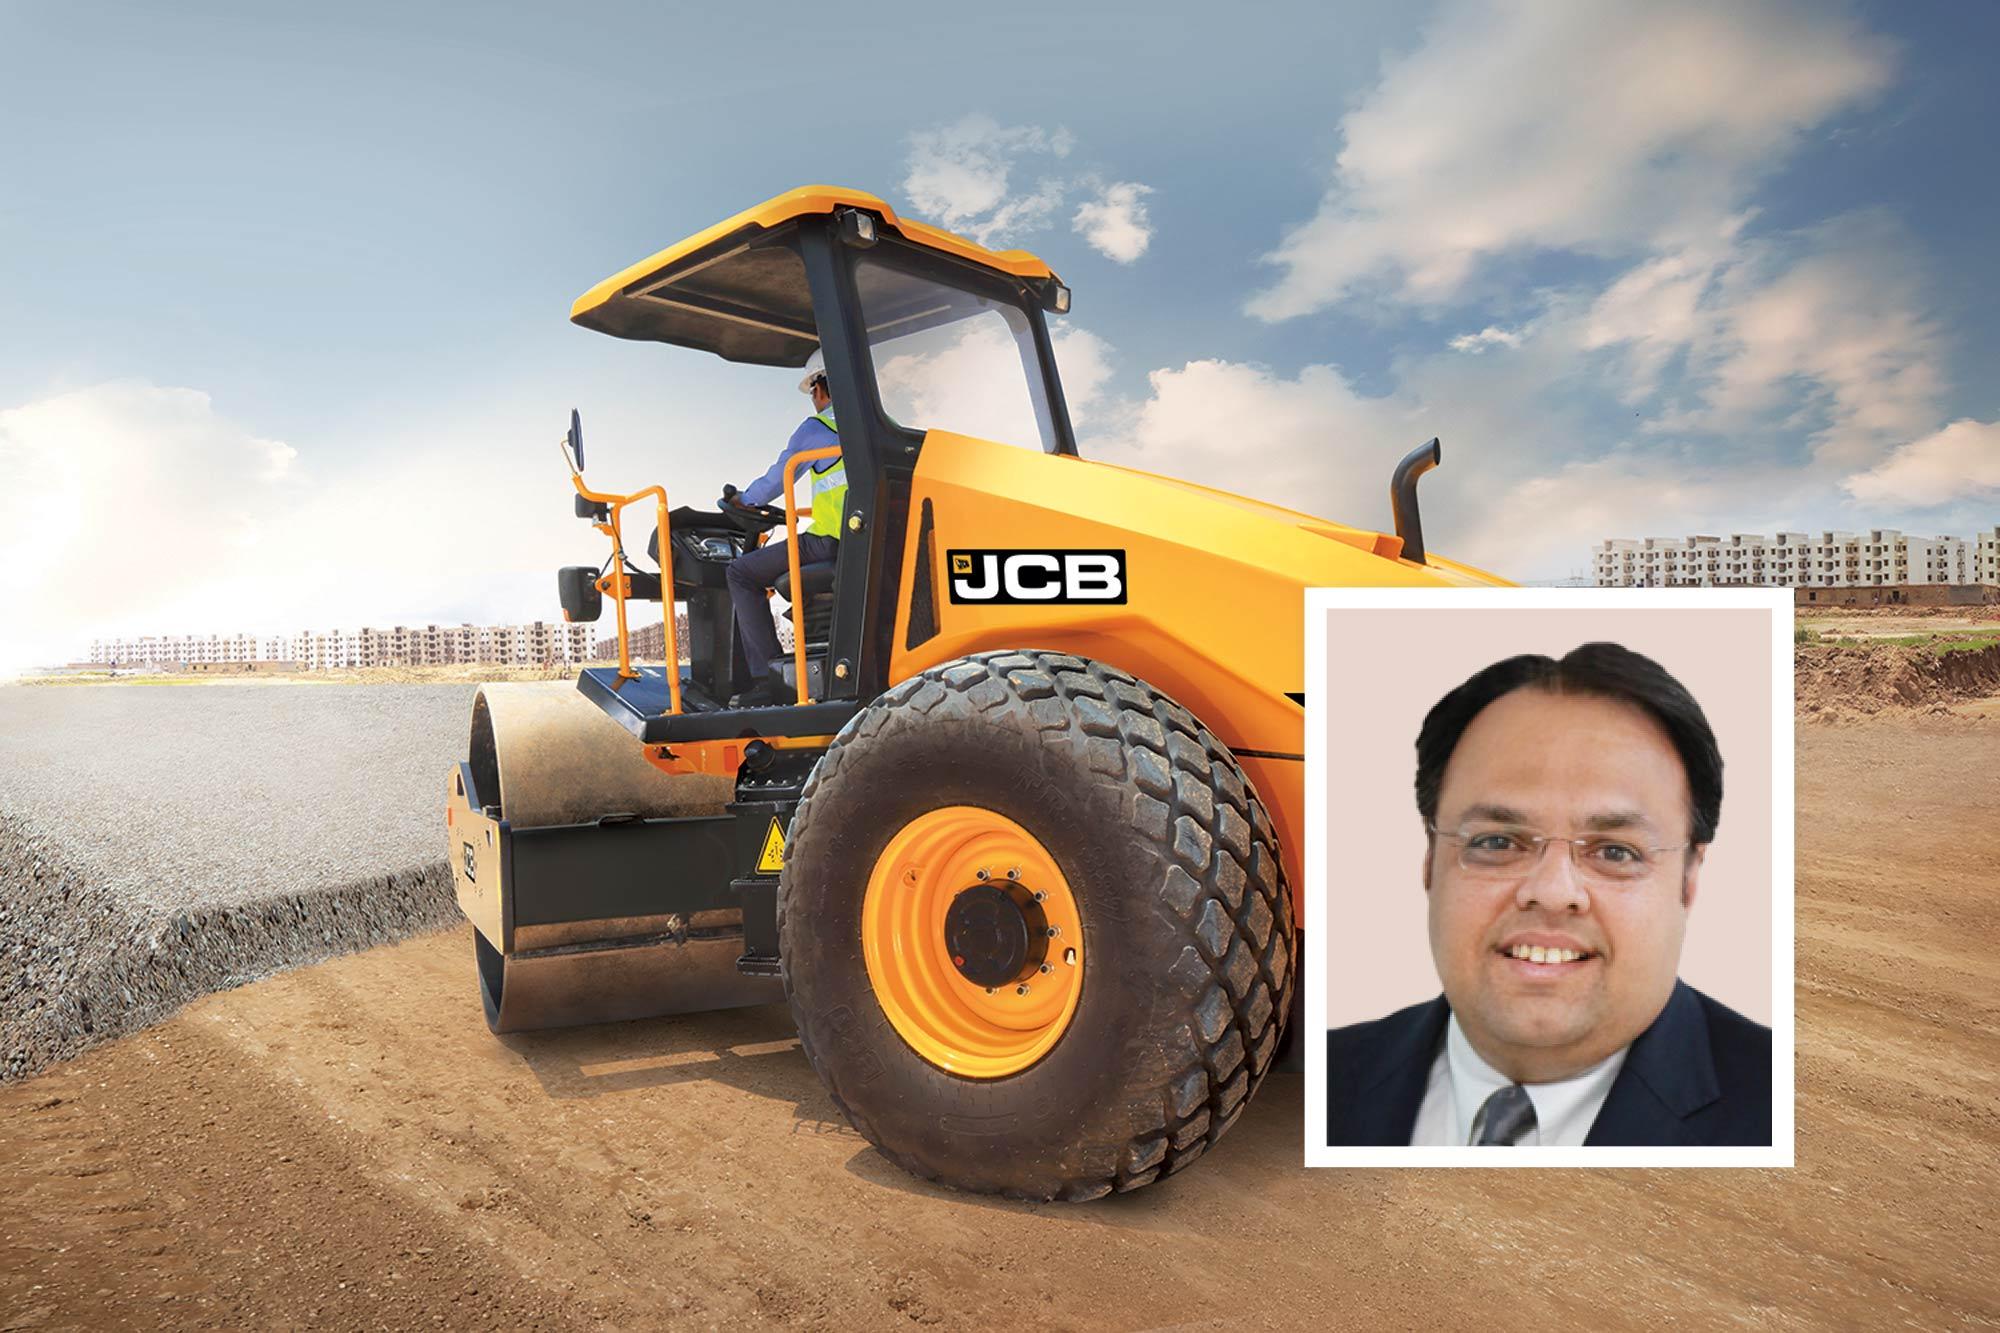 JCB brings revolutionary solutions for road making